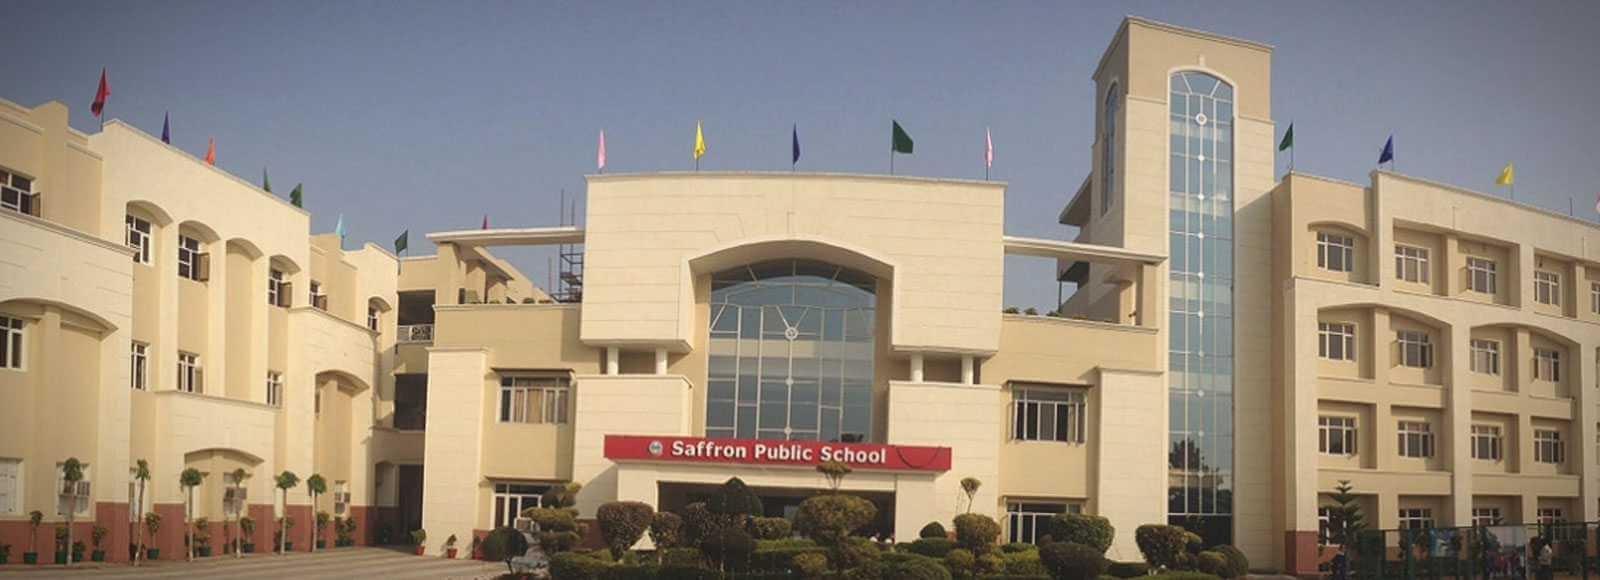 Saffron School (@saffron_school) Cover Image